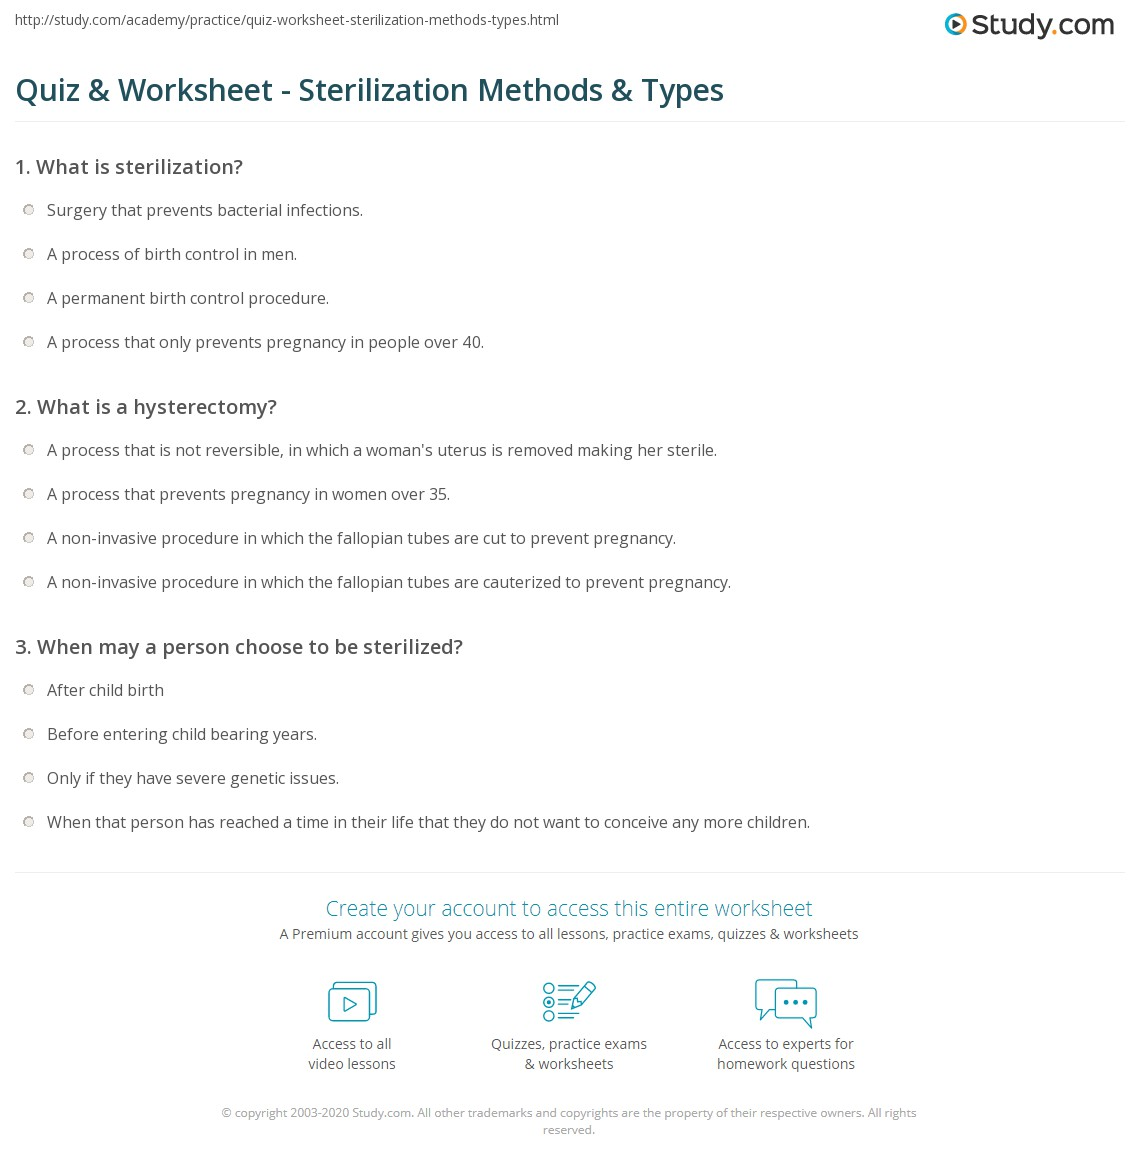 Types of sterilization - description, features and reviews 11